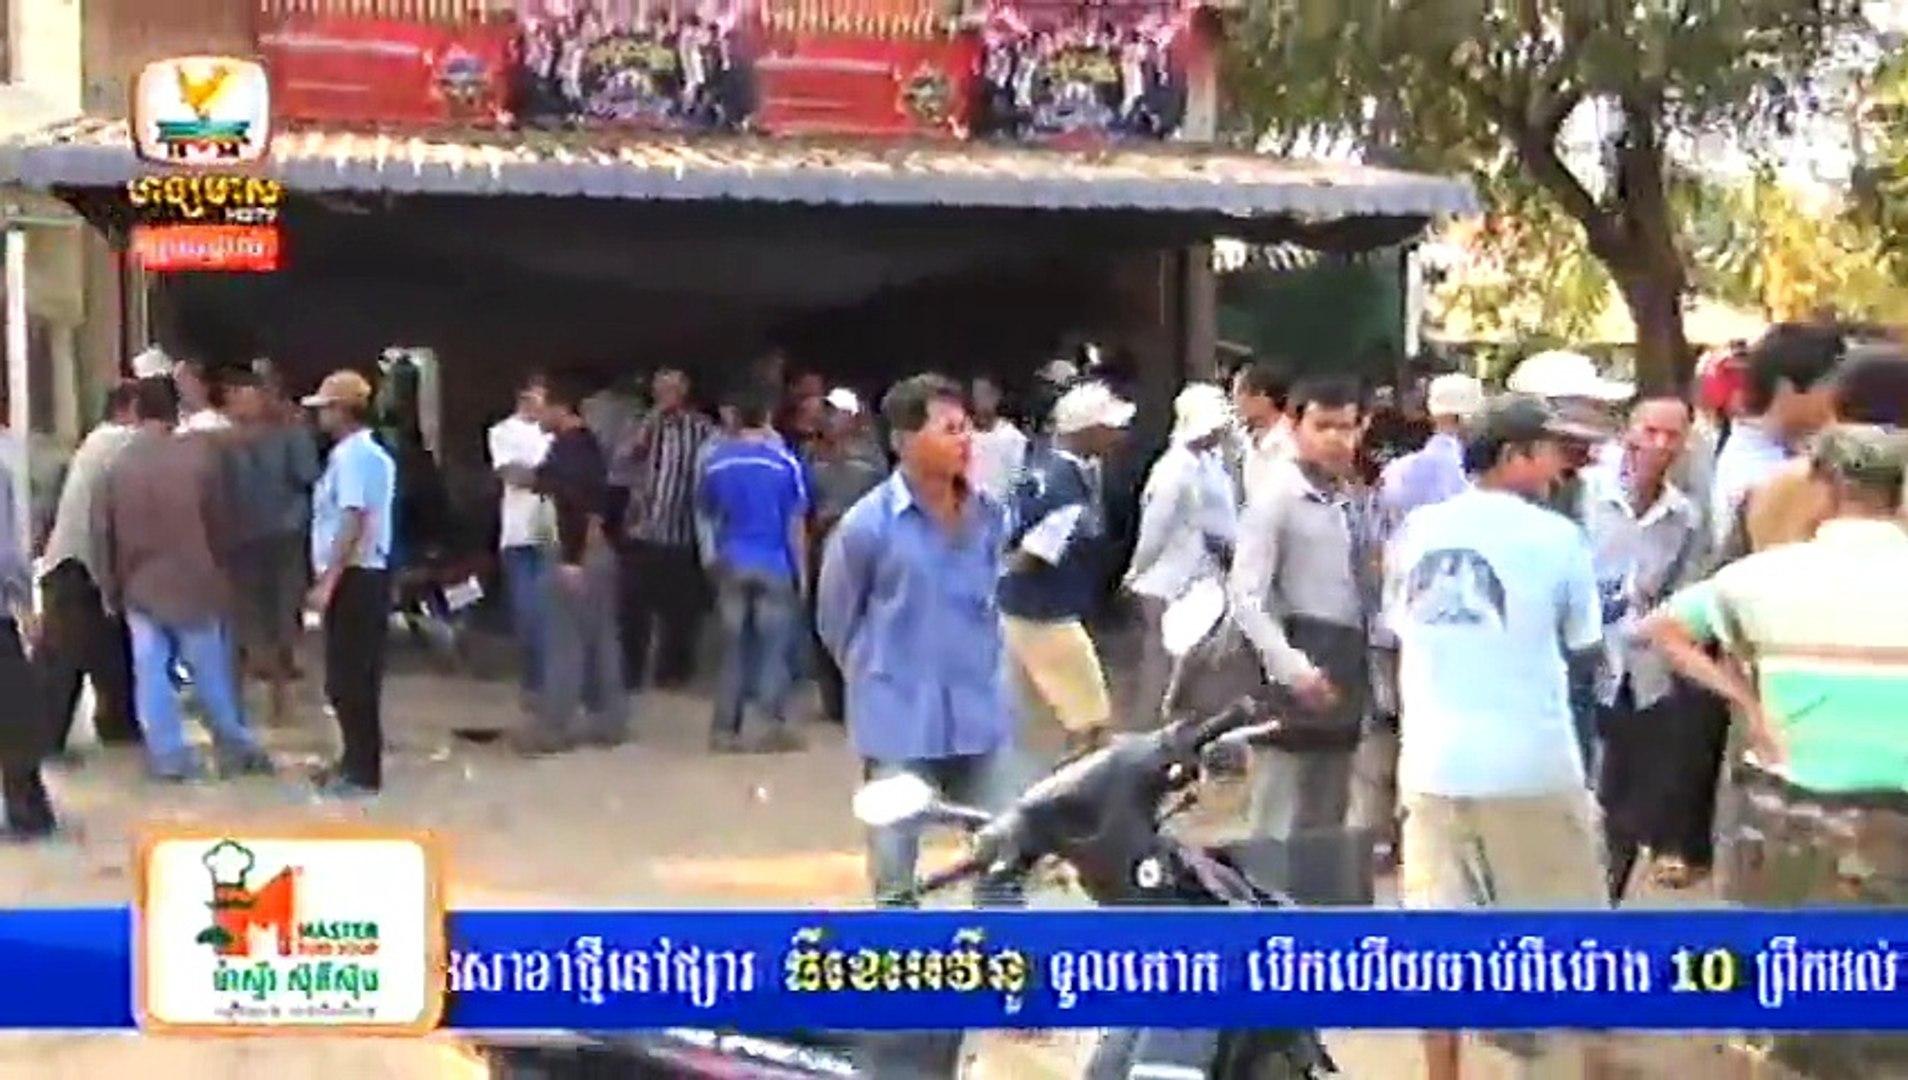 Khmer News, Hang Meas News, HDTV, 26 January 2015 Part 03 -Khmer News, Hang Meas News, HDTV, 26 Janu